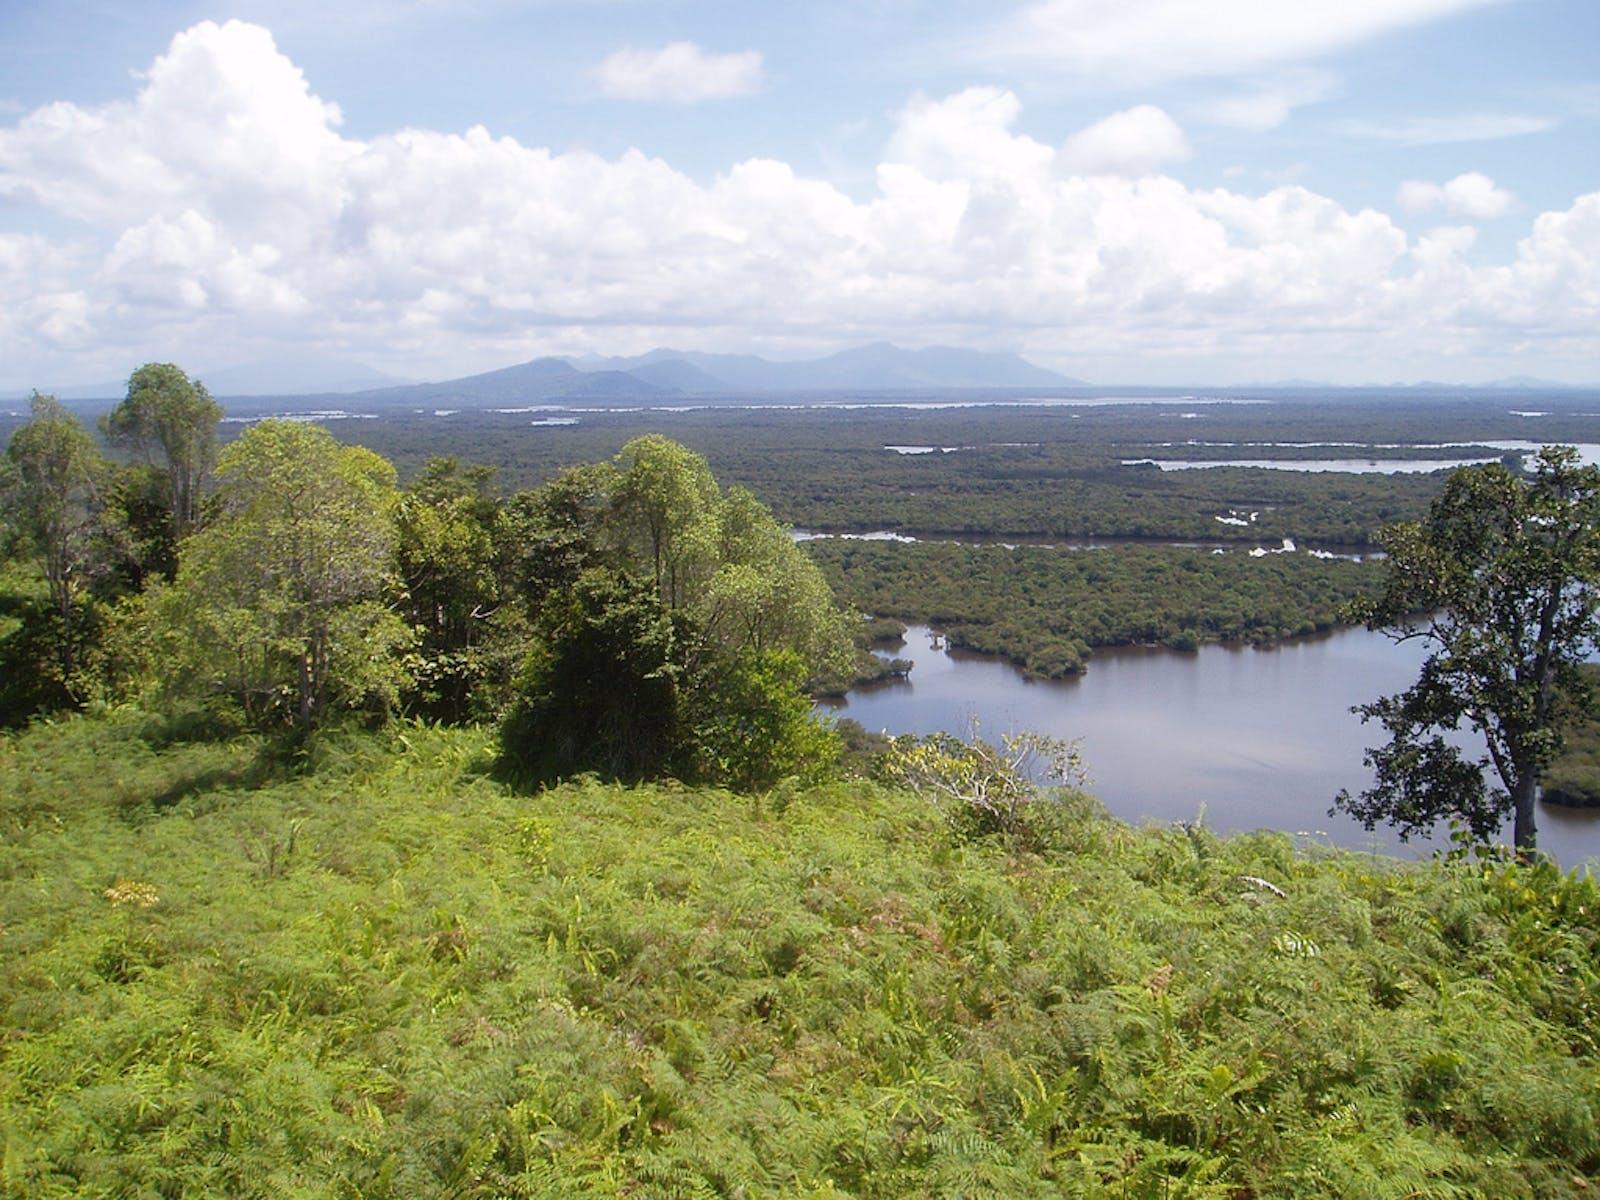 Southwest Borneo Freshwater Swamp Forests